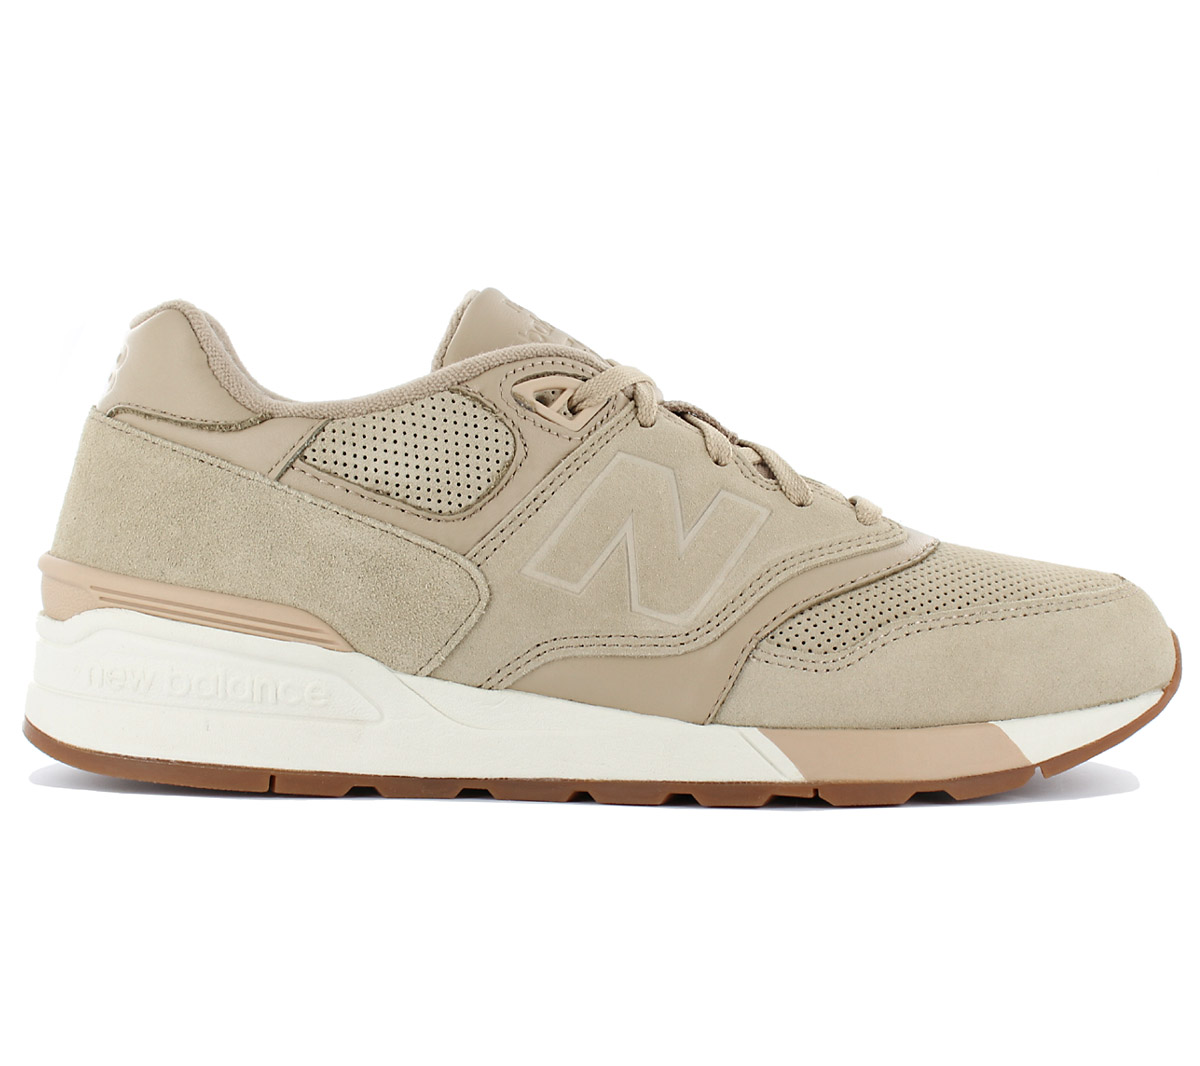 new balance 597 beige